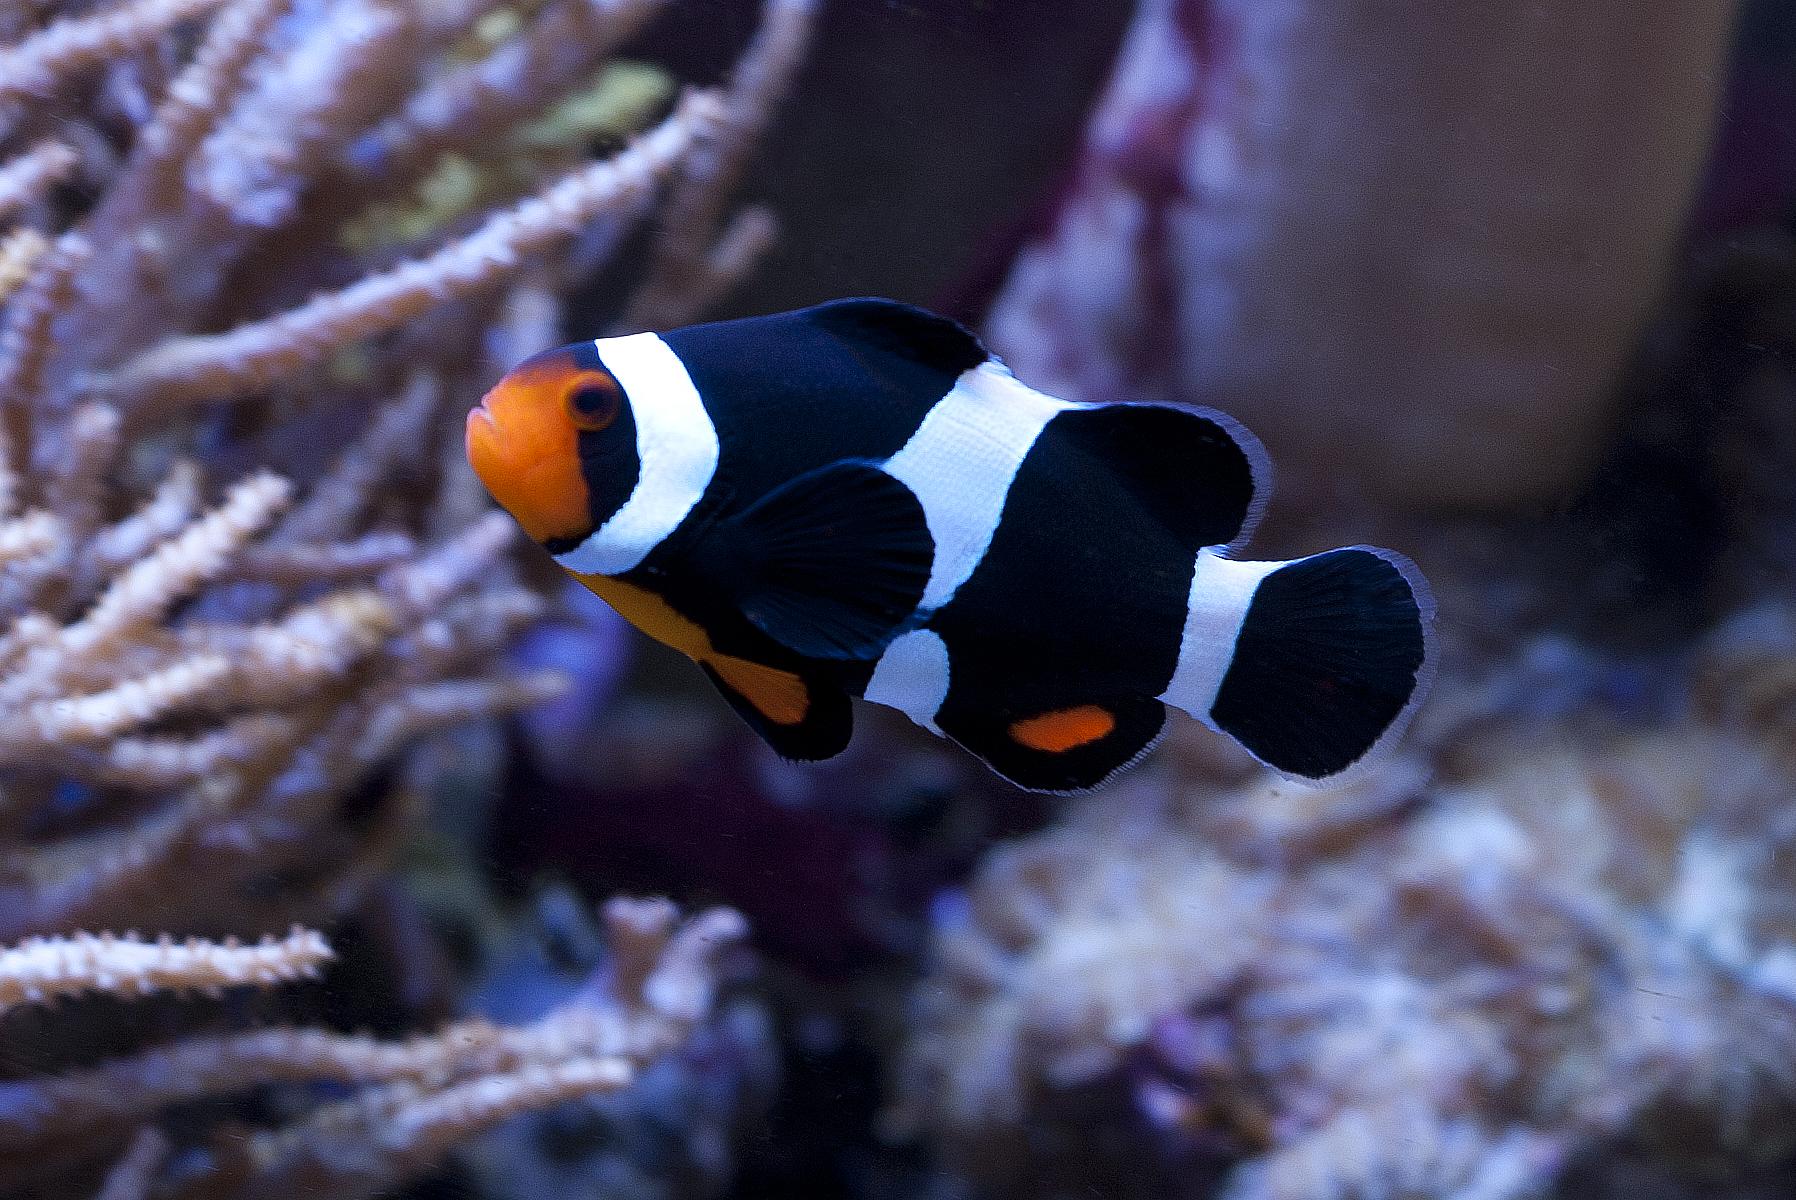 Amphiprion Ocellaris - Percula Clown - Black - Cativeiro